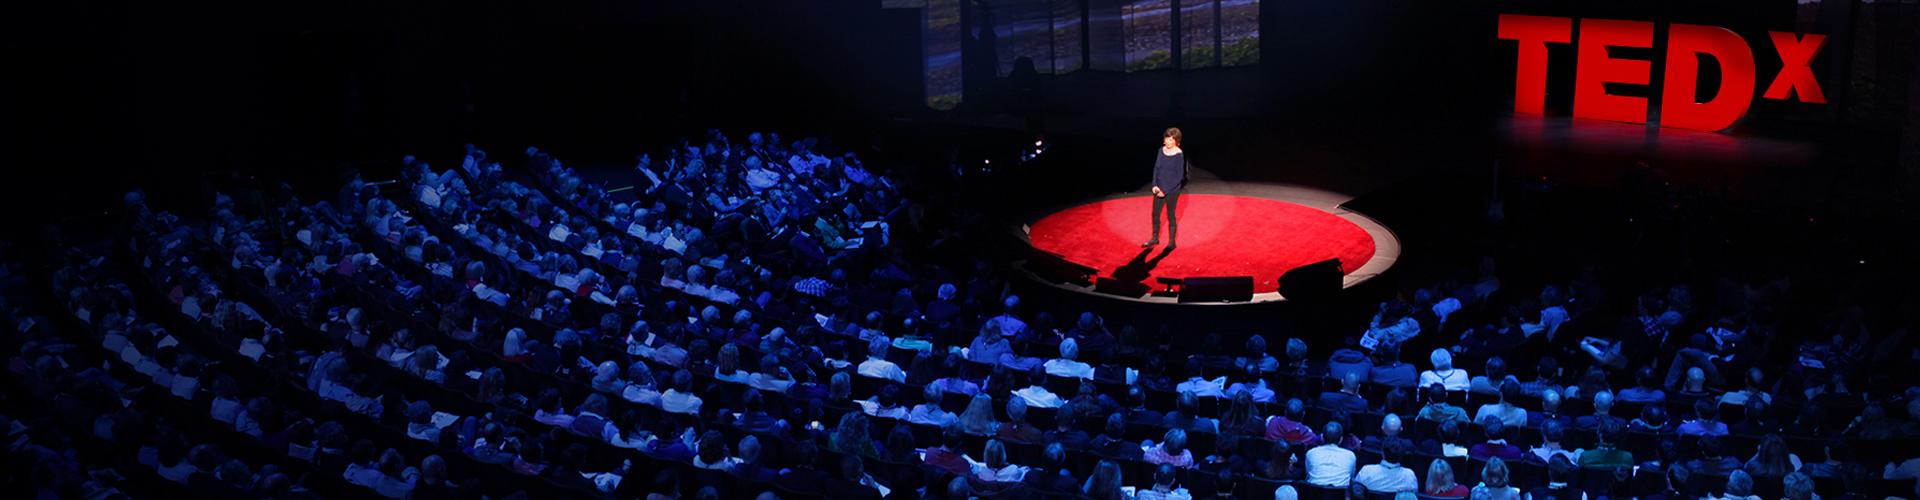 TEDx LegnanoCoworking